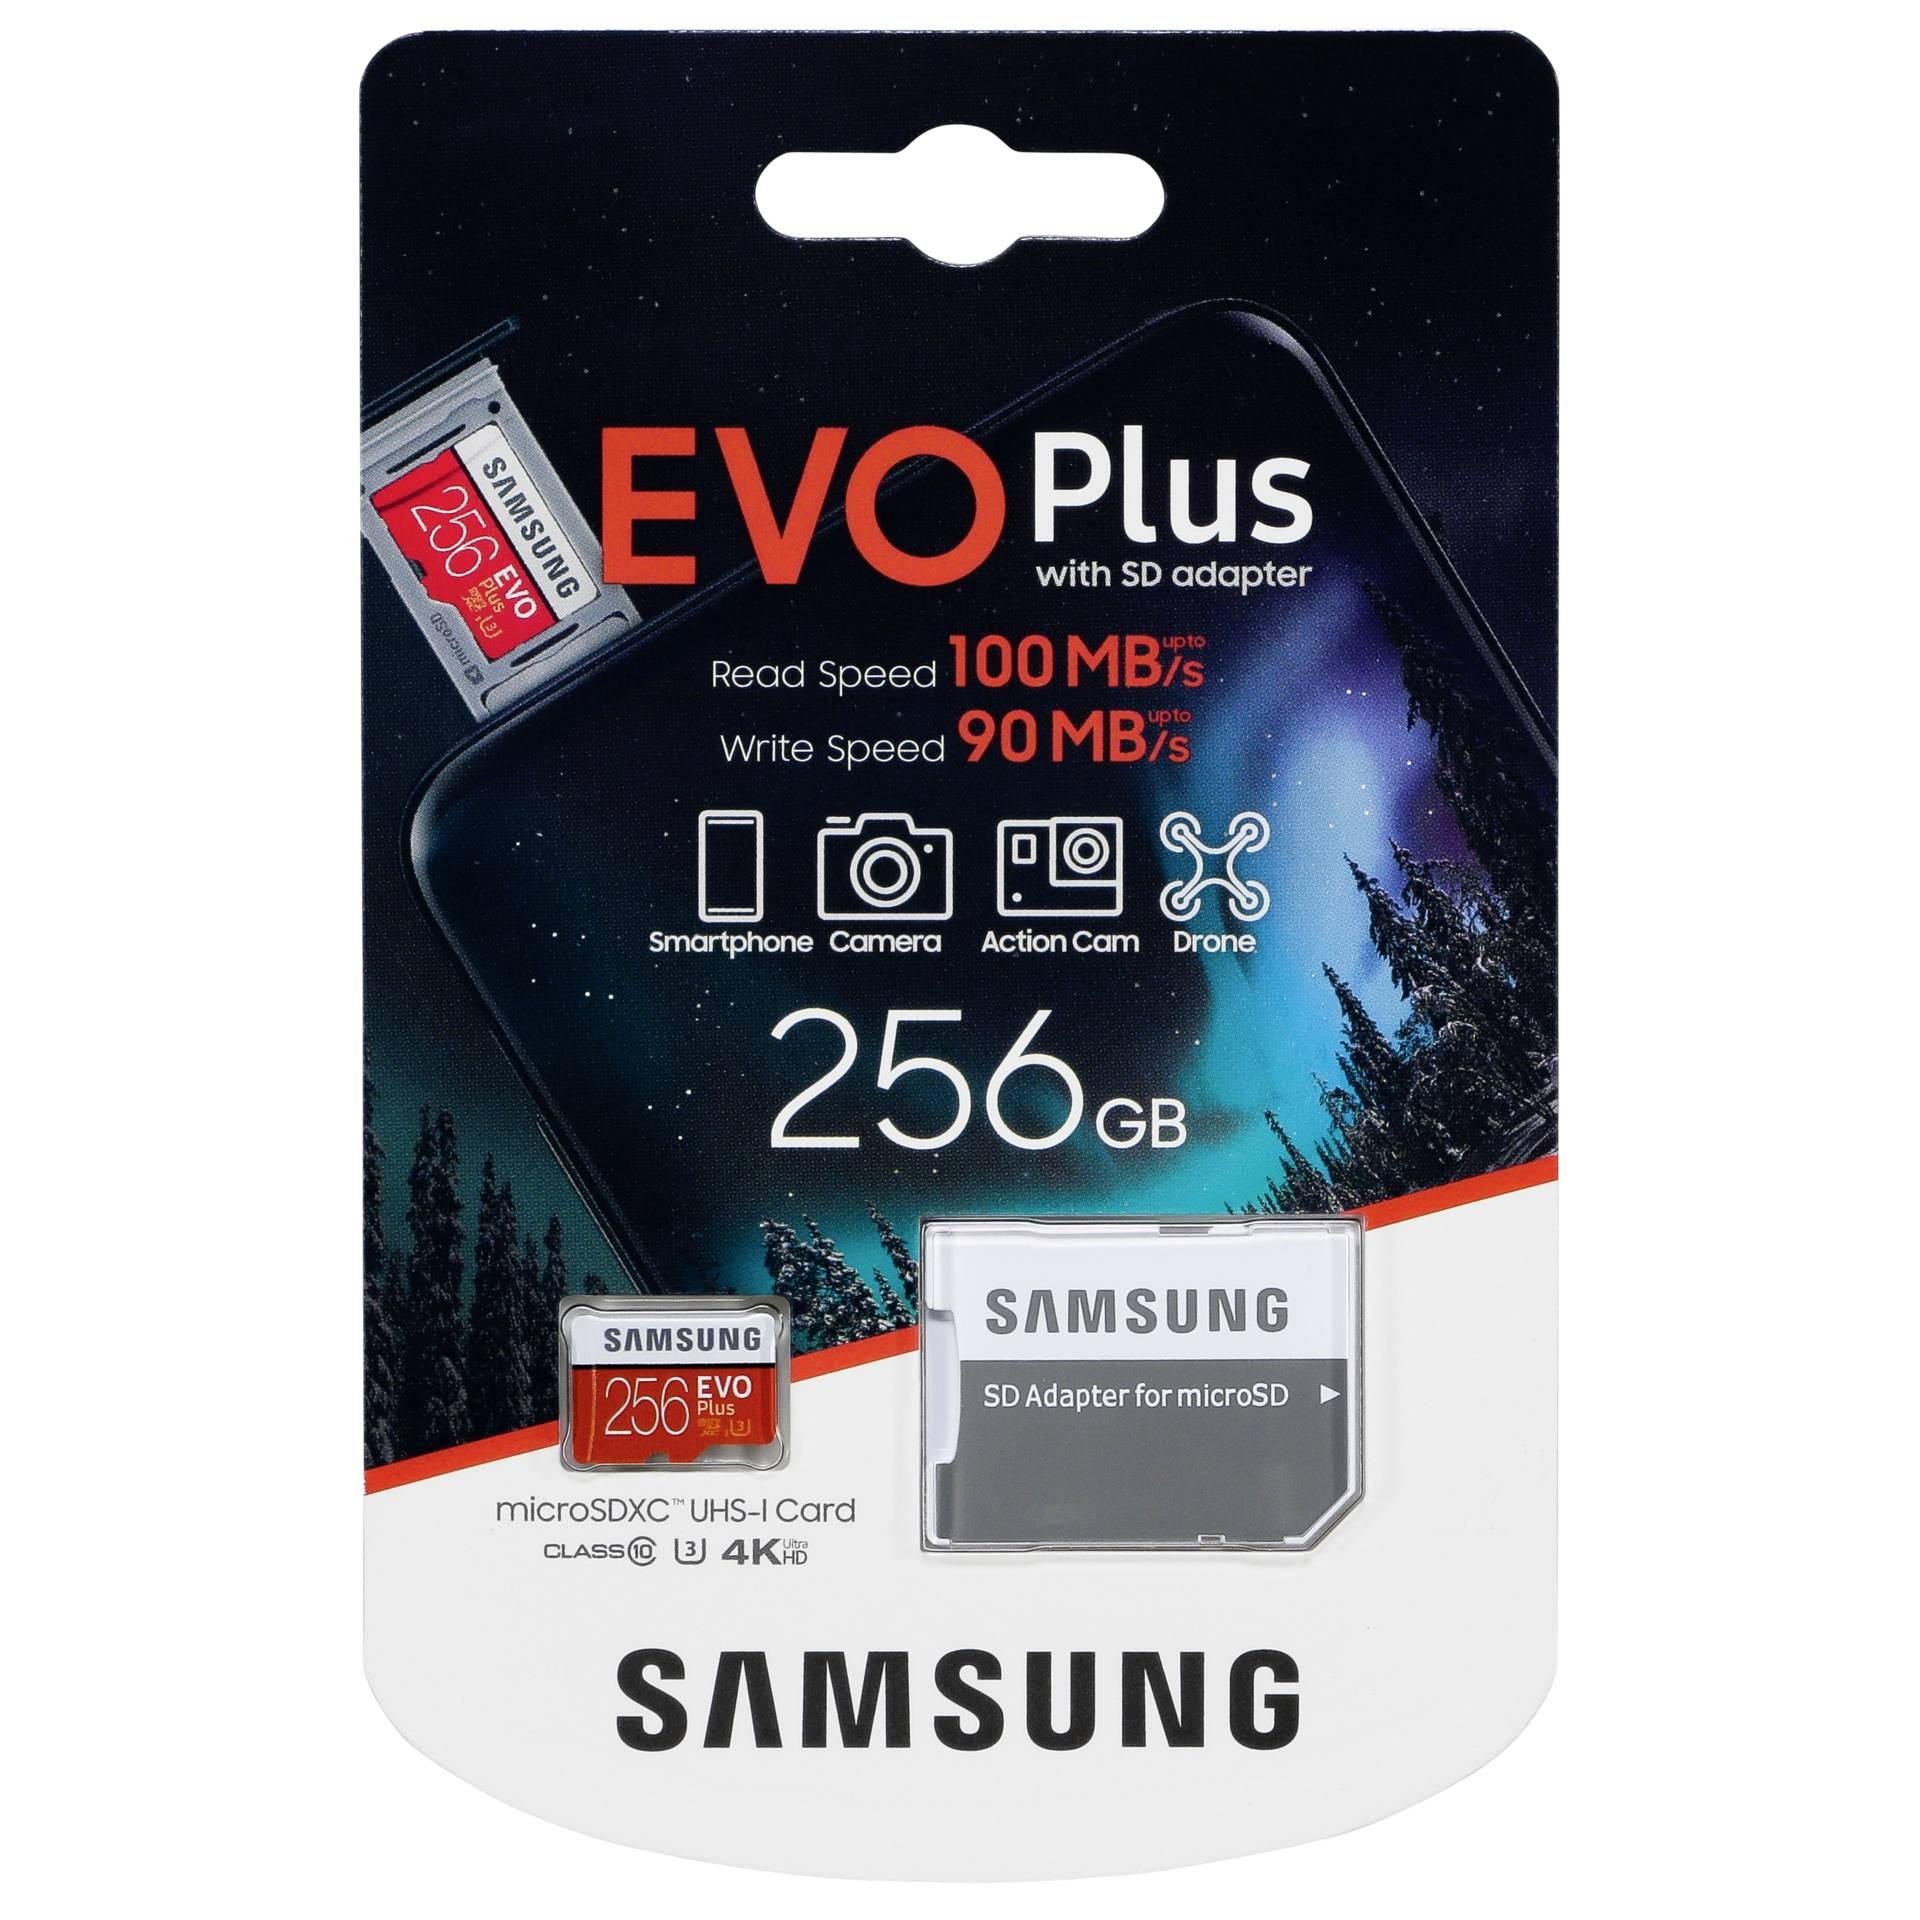 Samsung microSDXC EVO Plus 256GB with adapter UHS-I